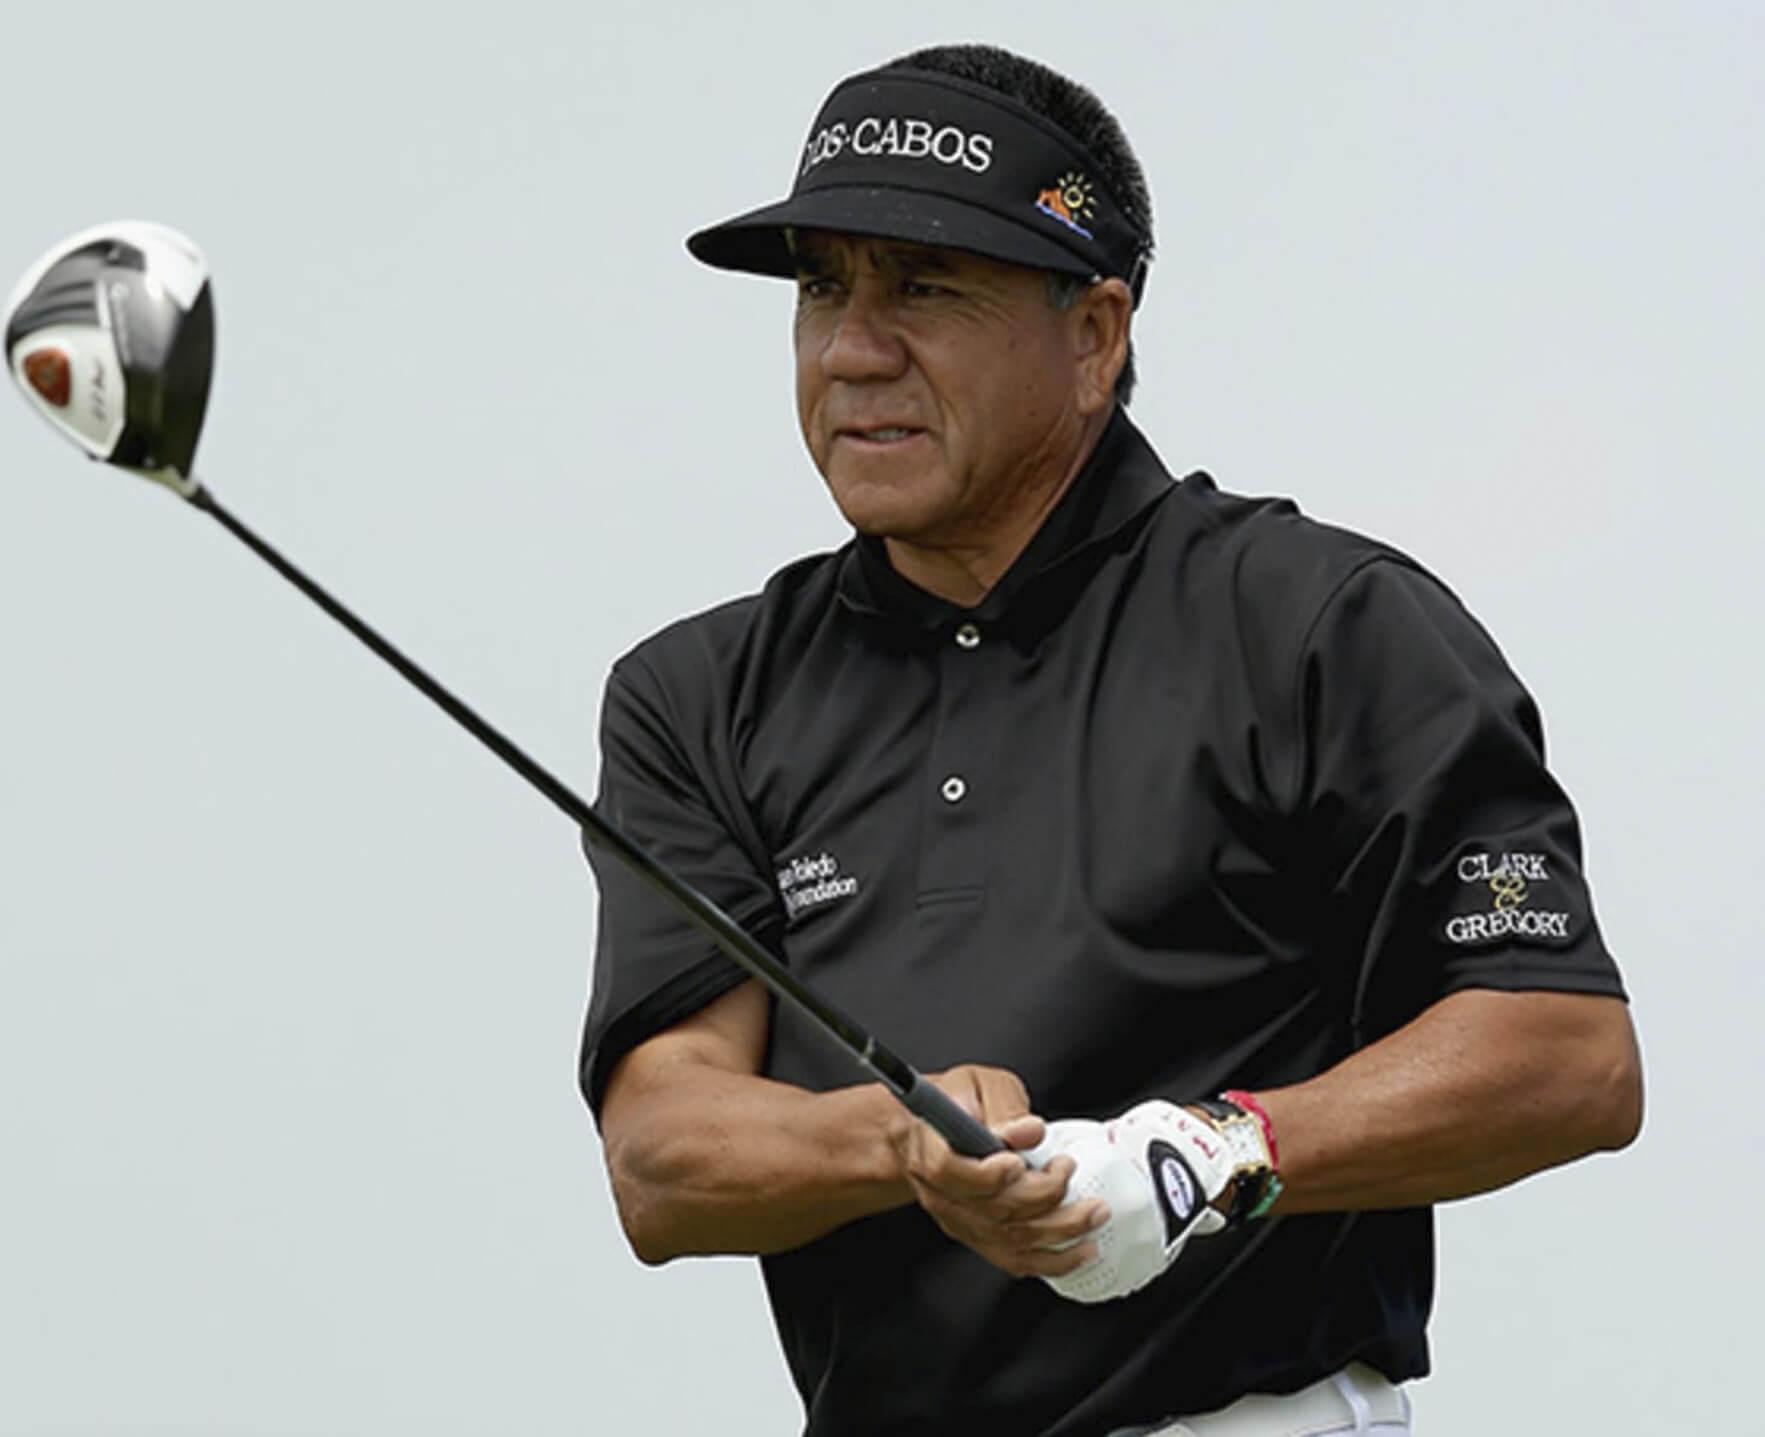 esteban toledo mexican professional golfer